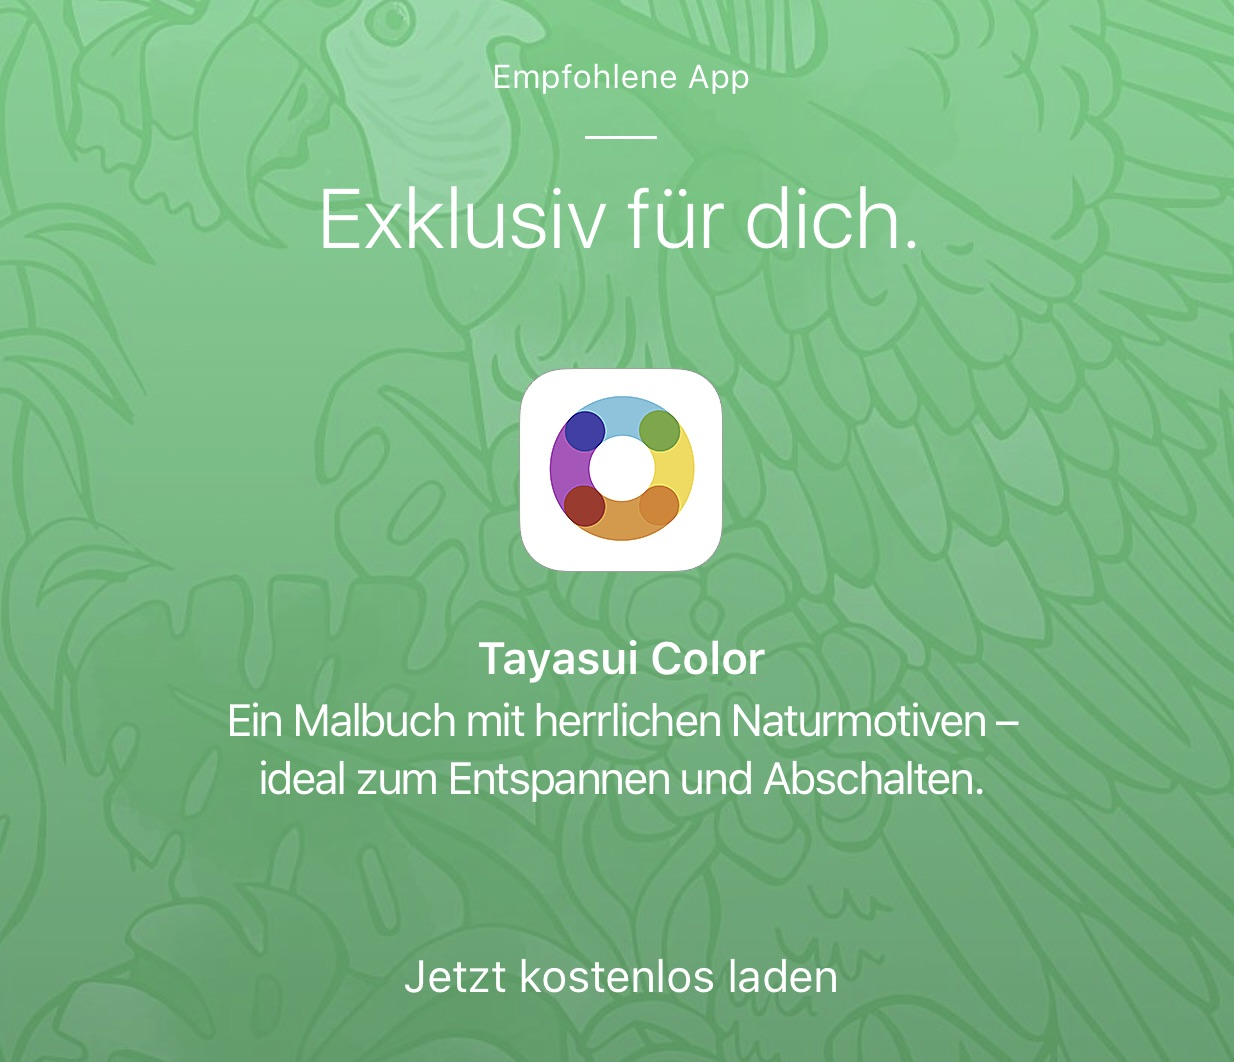 tayasui_color_gratis